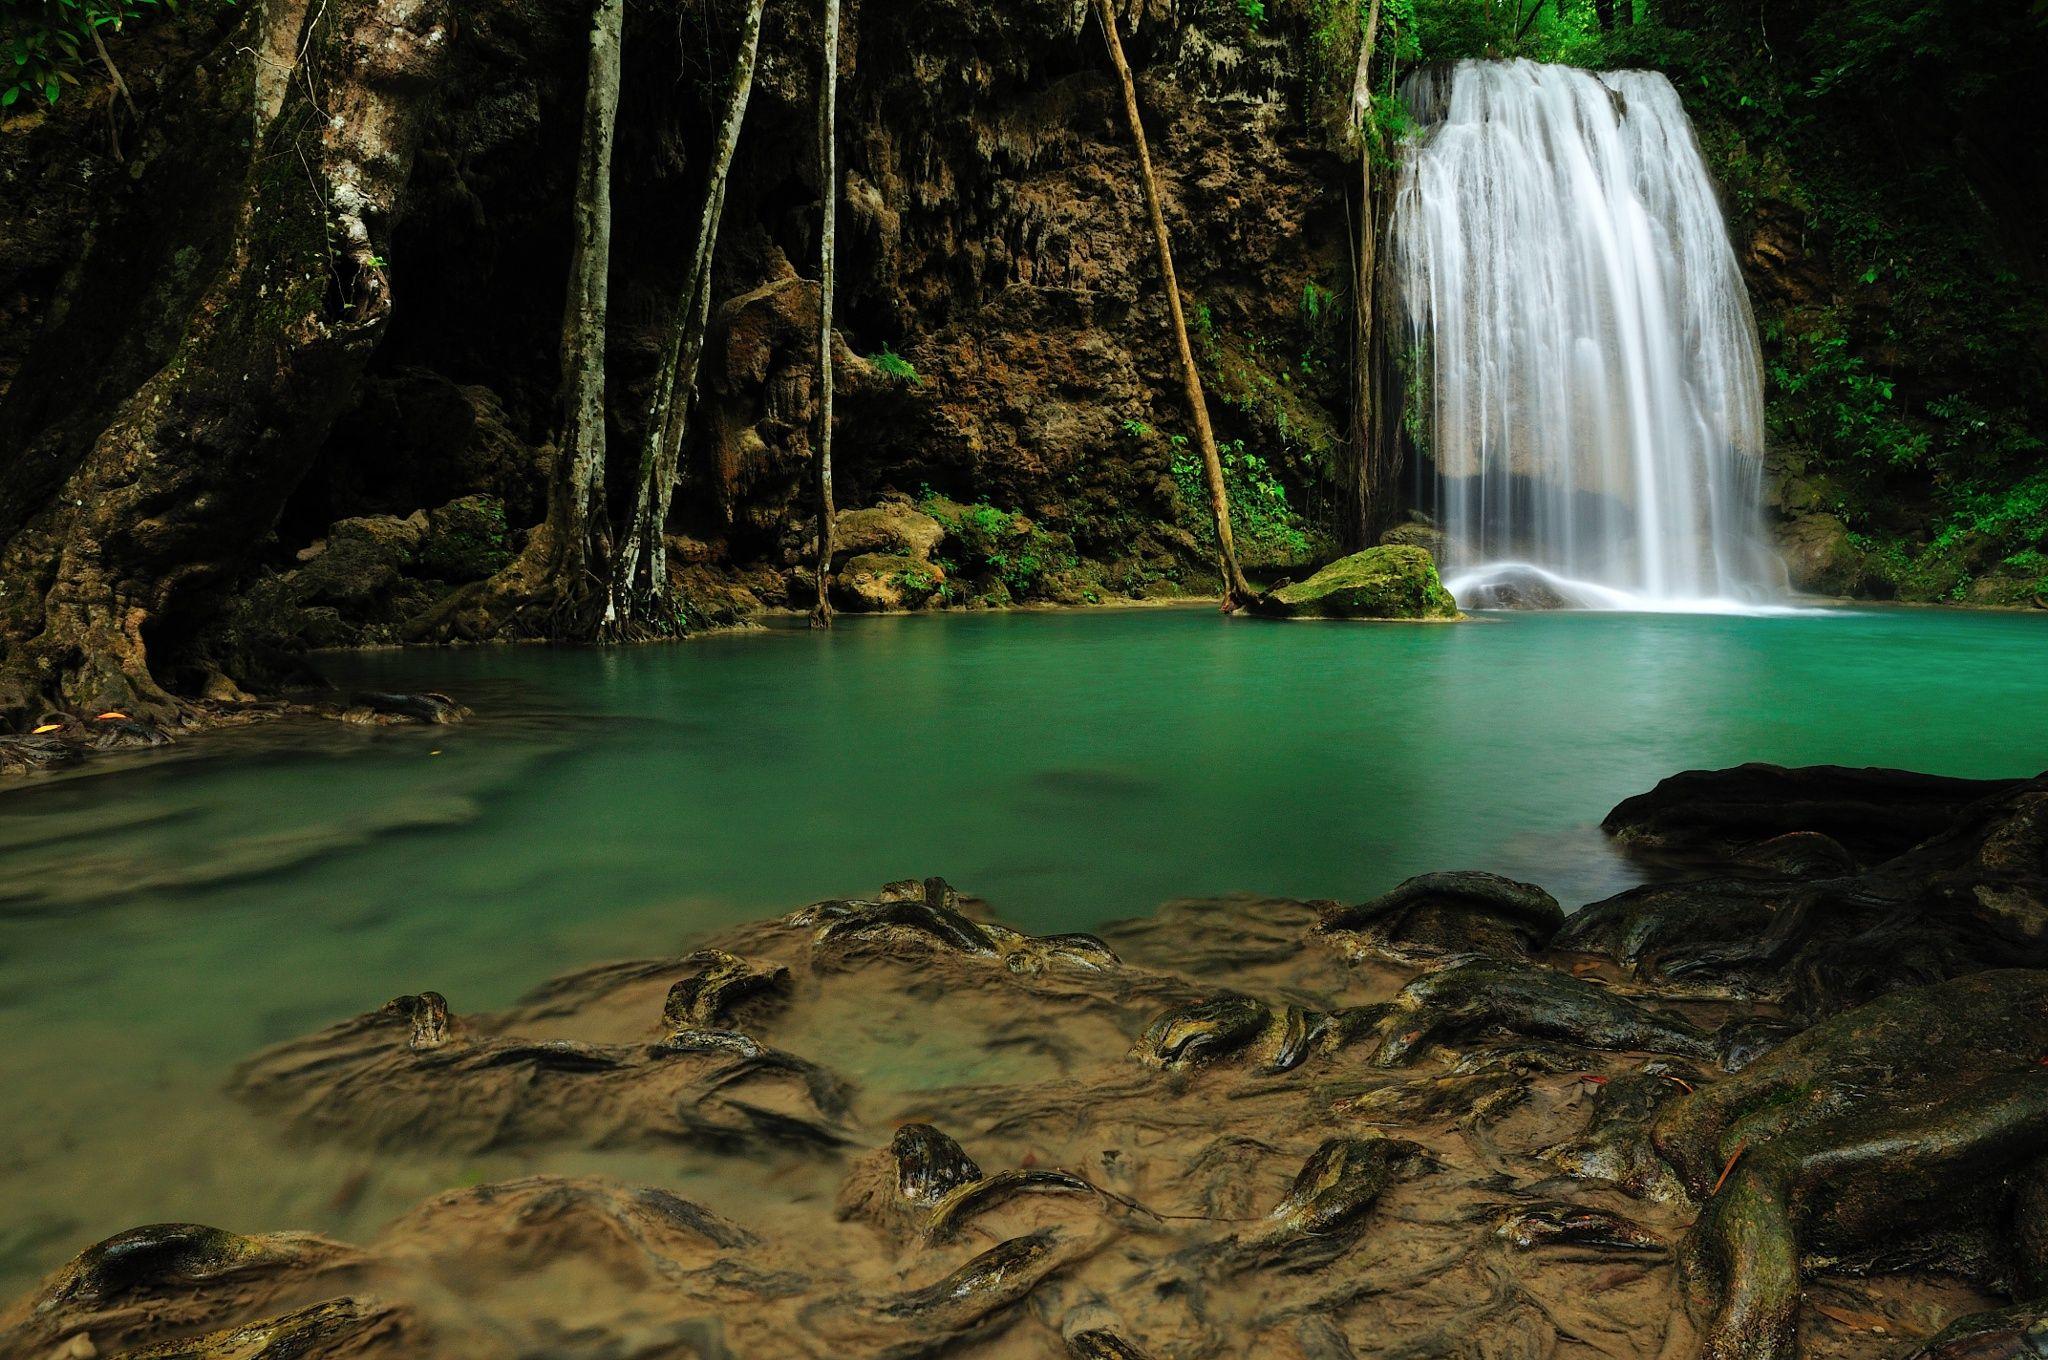 The Root - Location : Erawan waterfall Kanchanaburi province Thailand